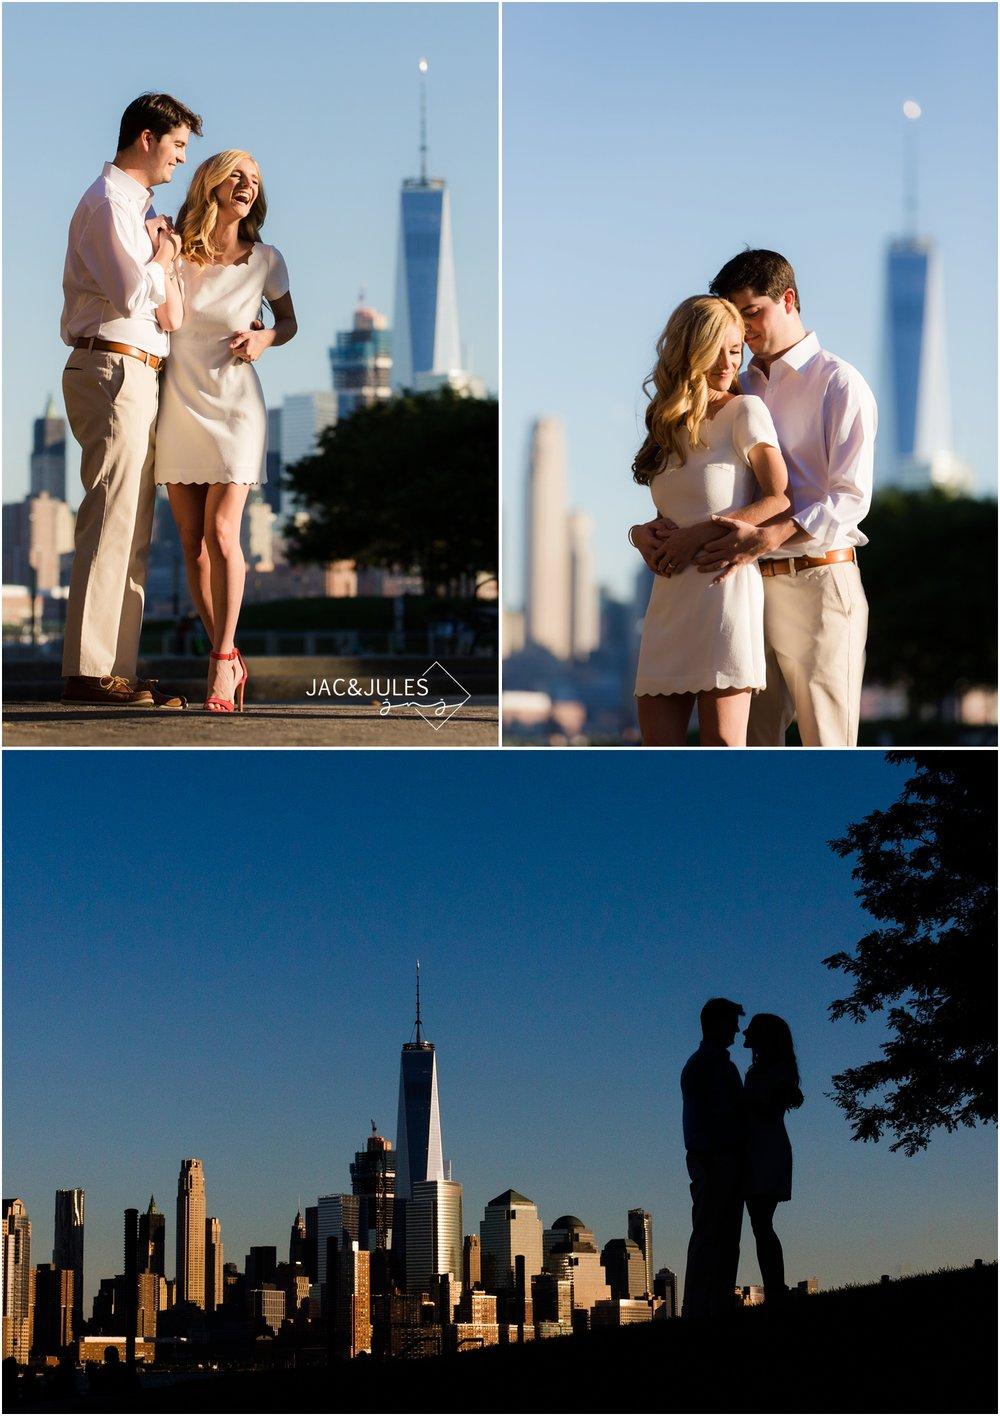 sunny engagement photos with New York city skyline in hoboken, nj.